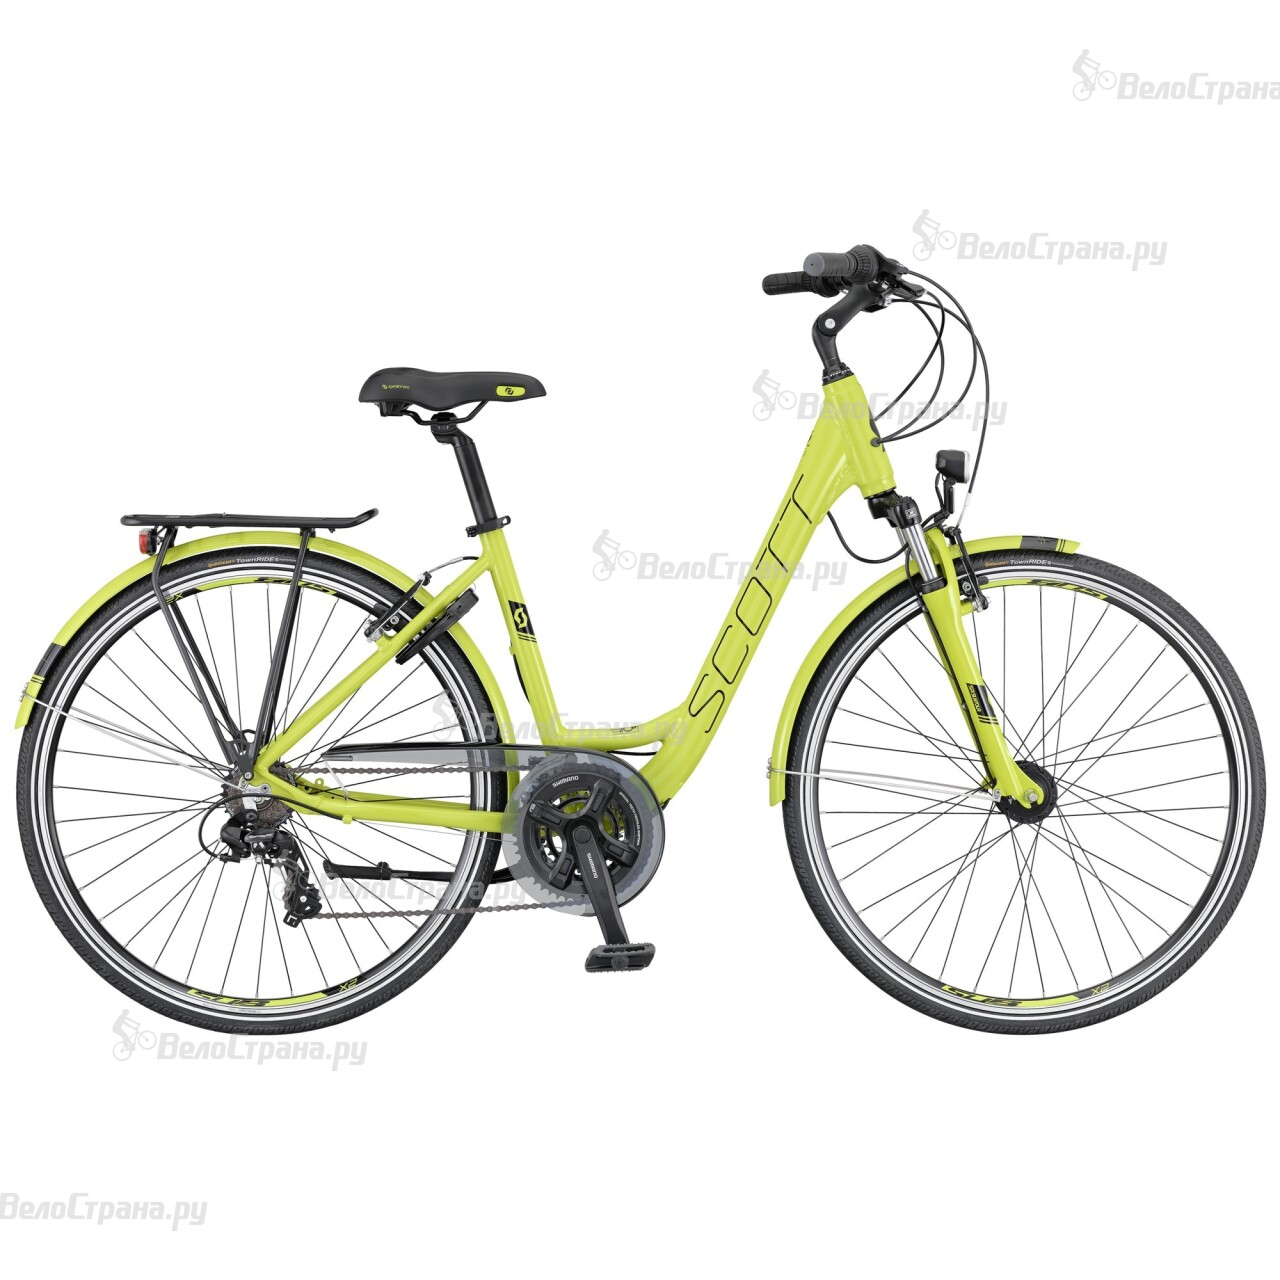 Велосипед Scott Sub Comfort 20 Unisex (2016) велосипед scott aspect 700 27 5 2016